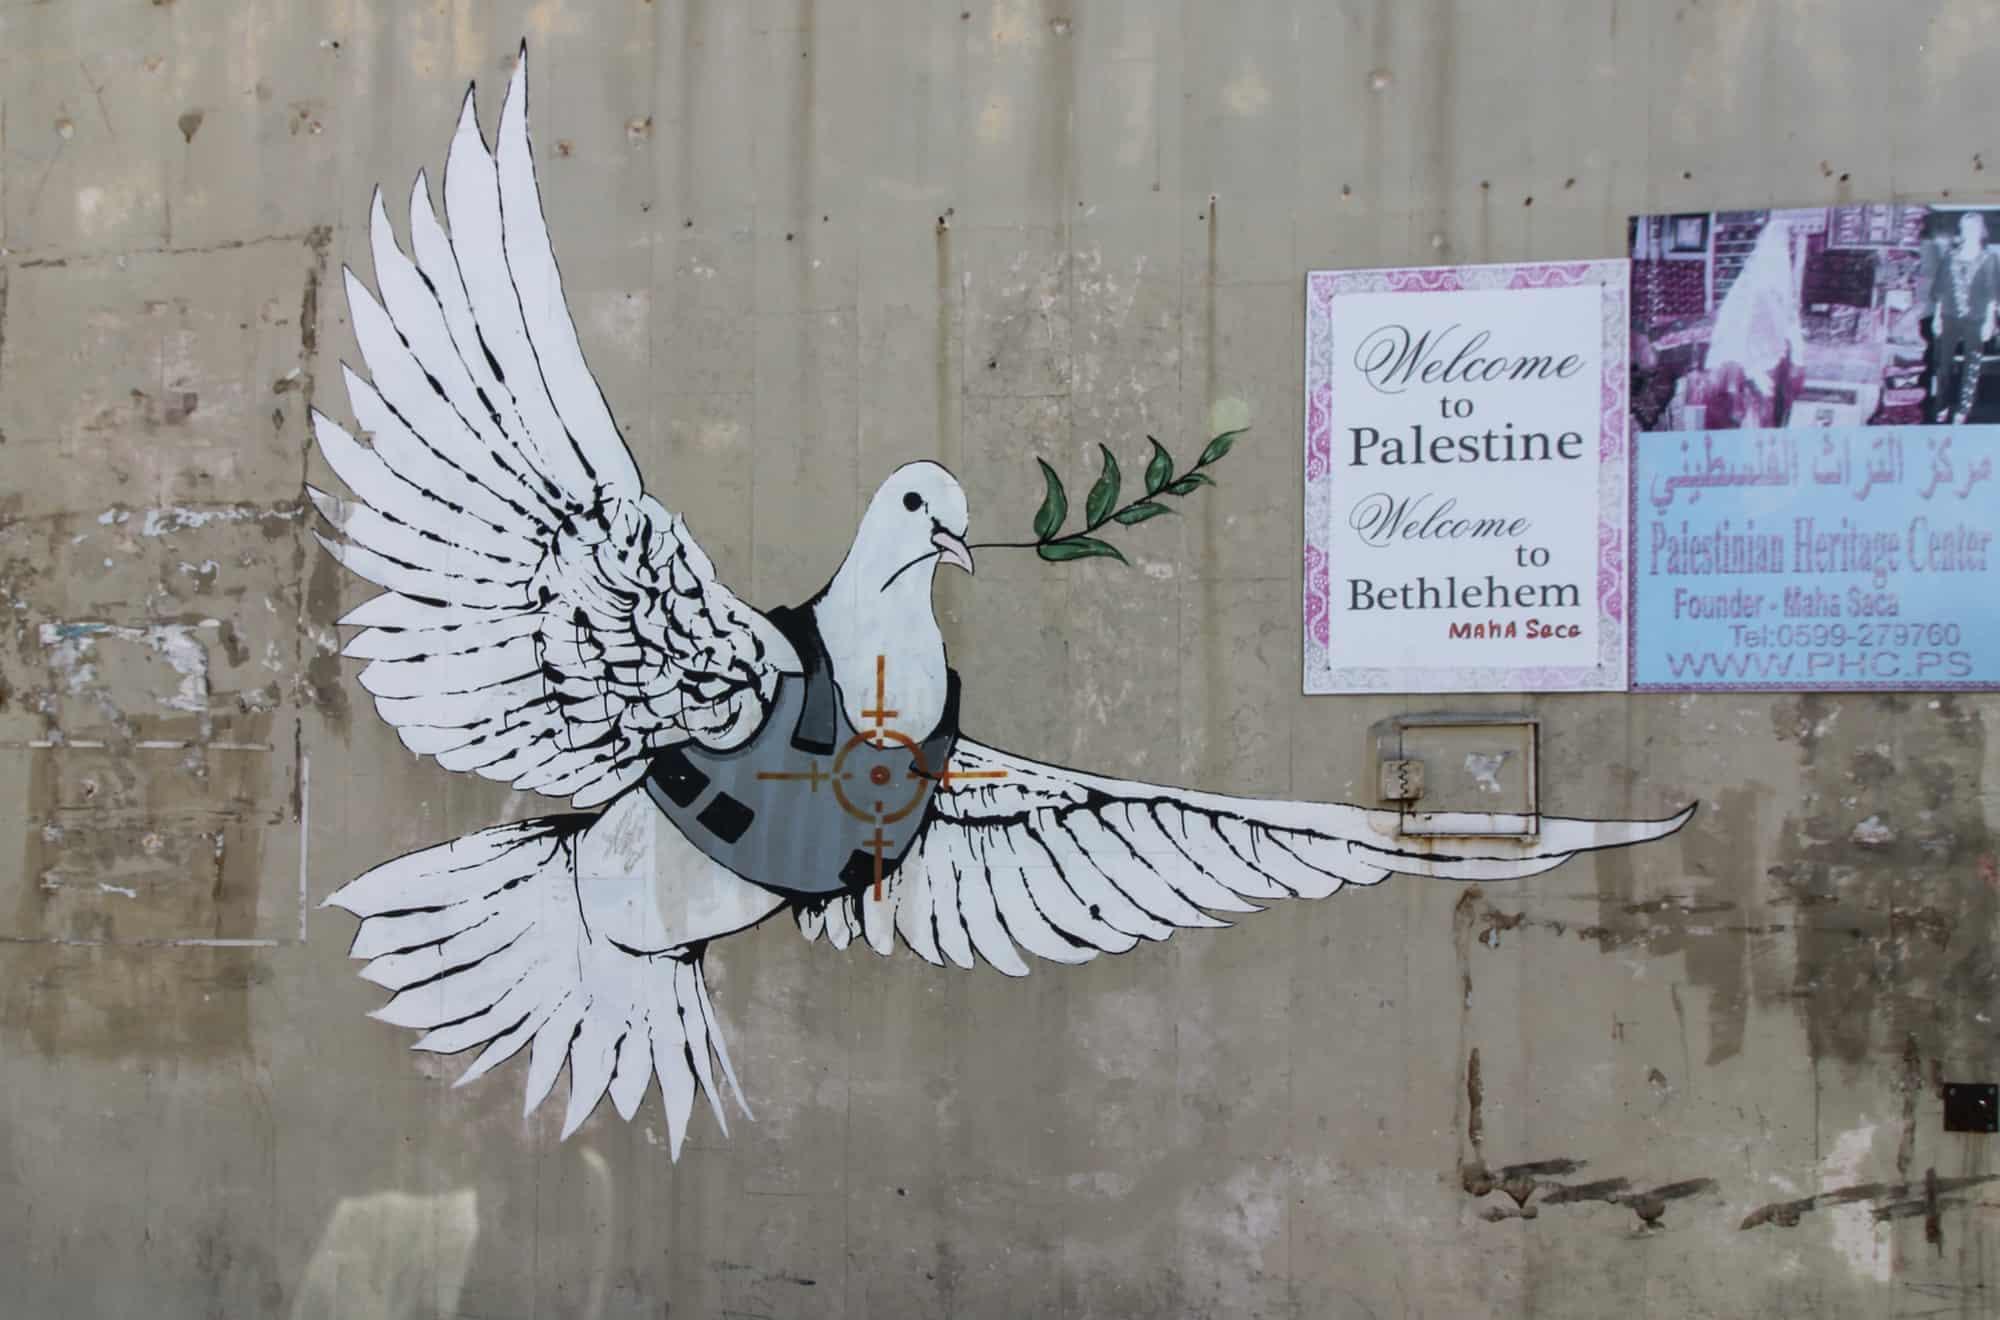 friedenstaube graffiti